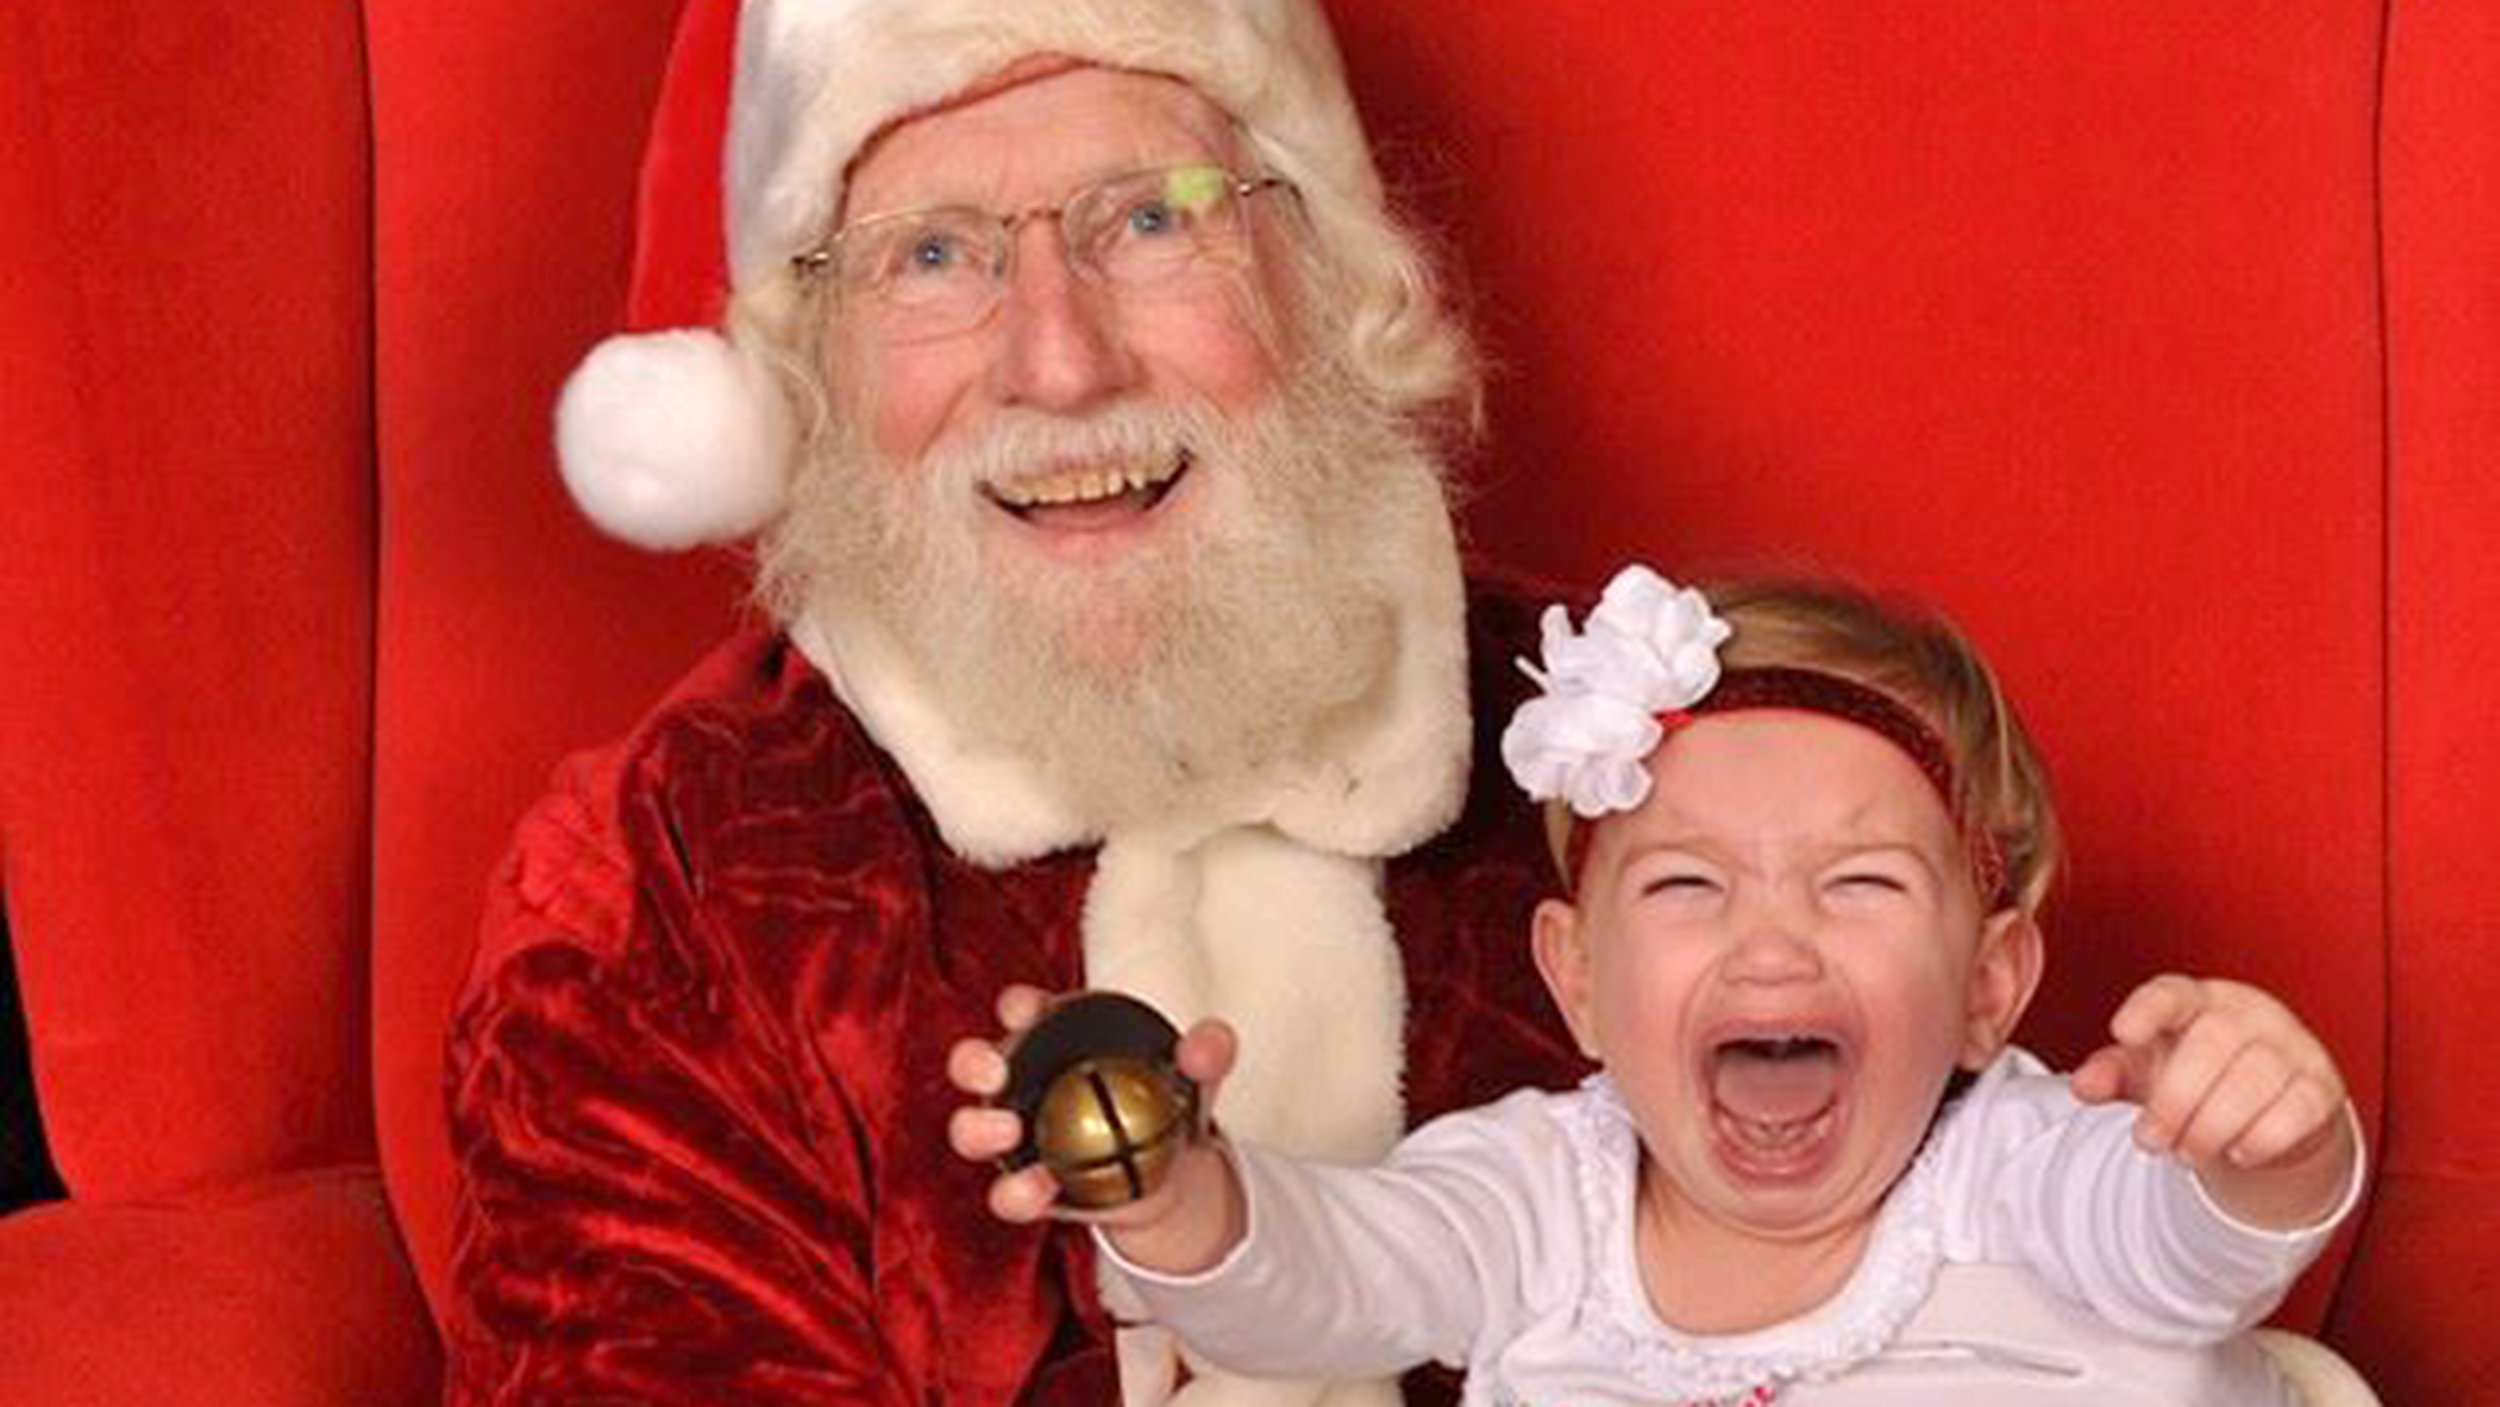 Kids scared of santa 15 photos of hilarious ho ho horror